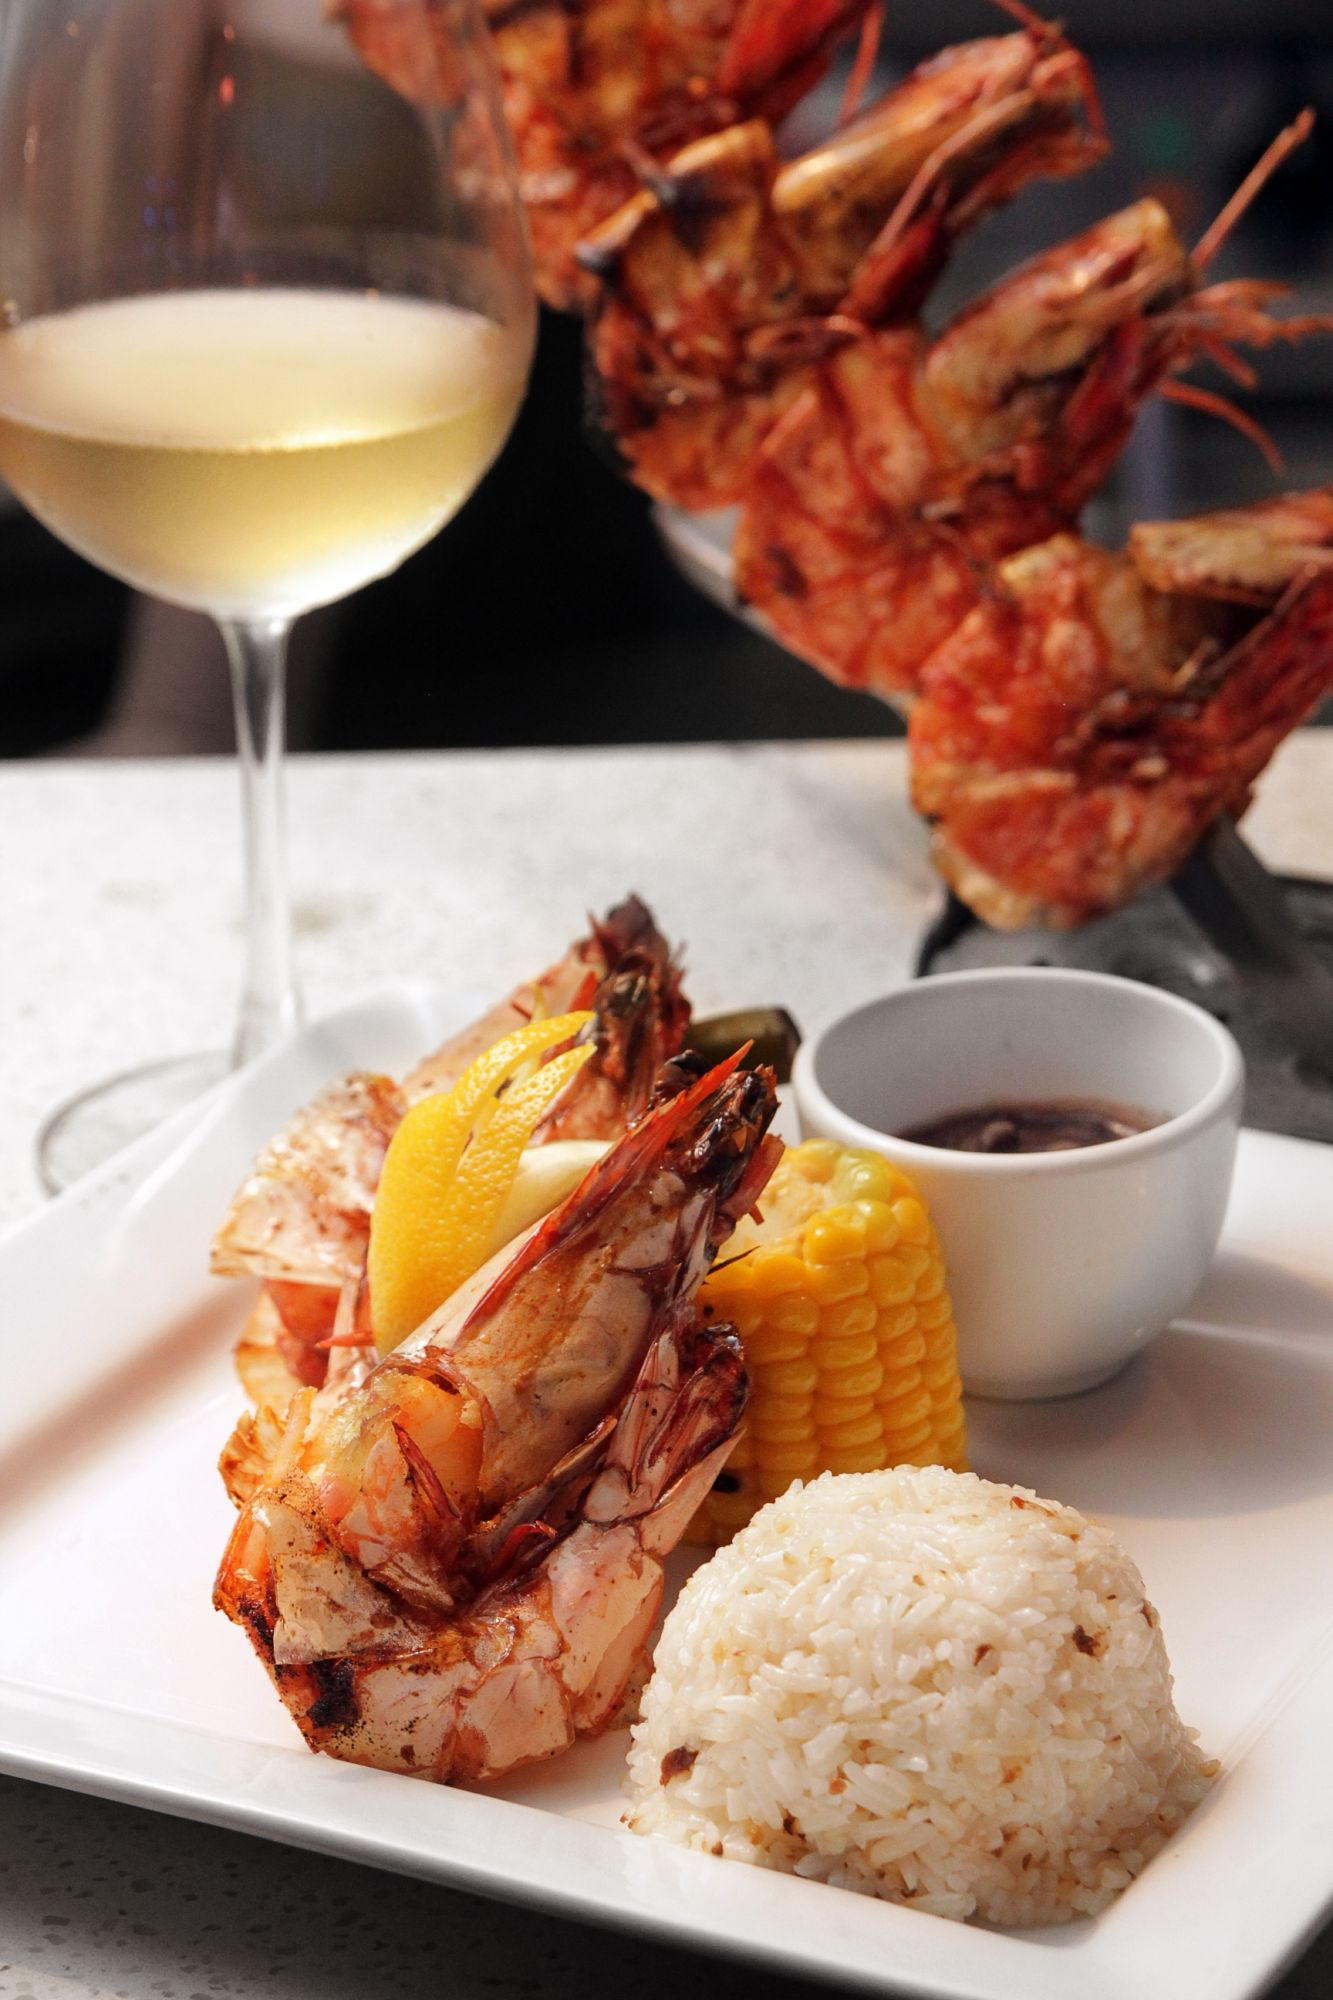 Wine And Dinner Affair At Ibiza Beach Club This December